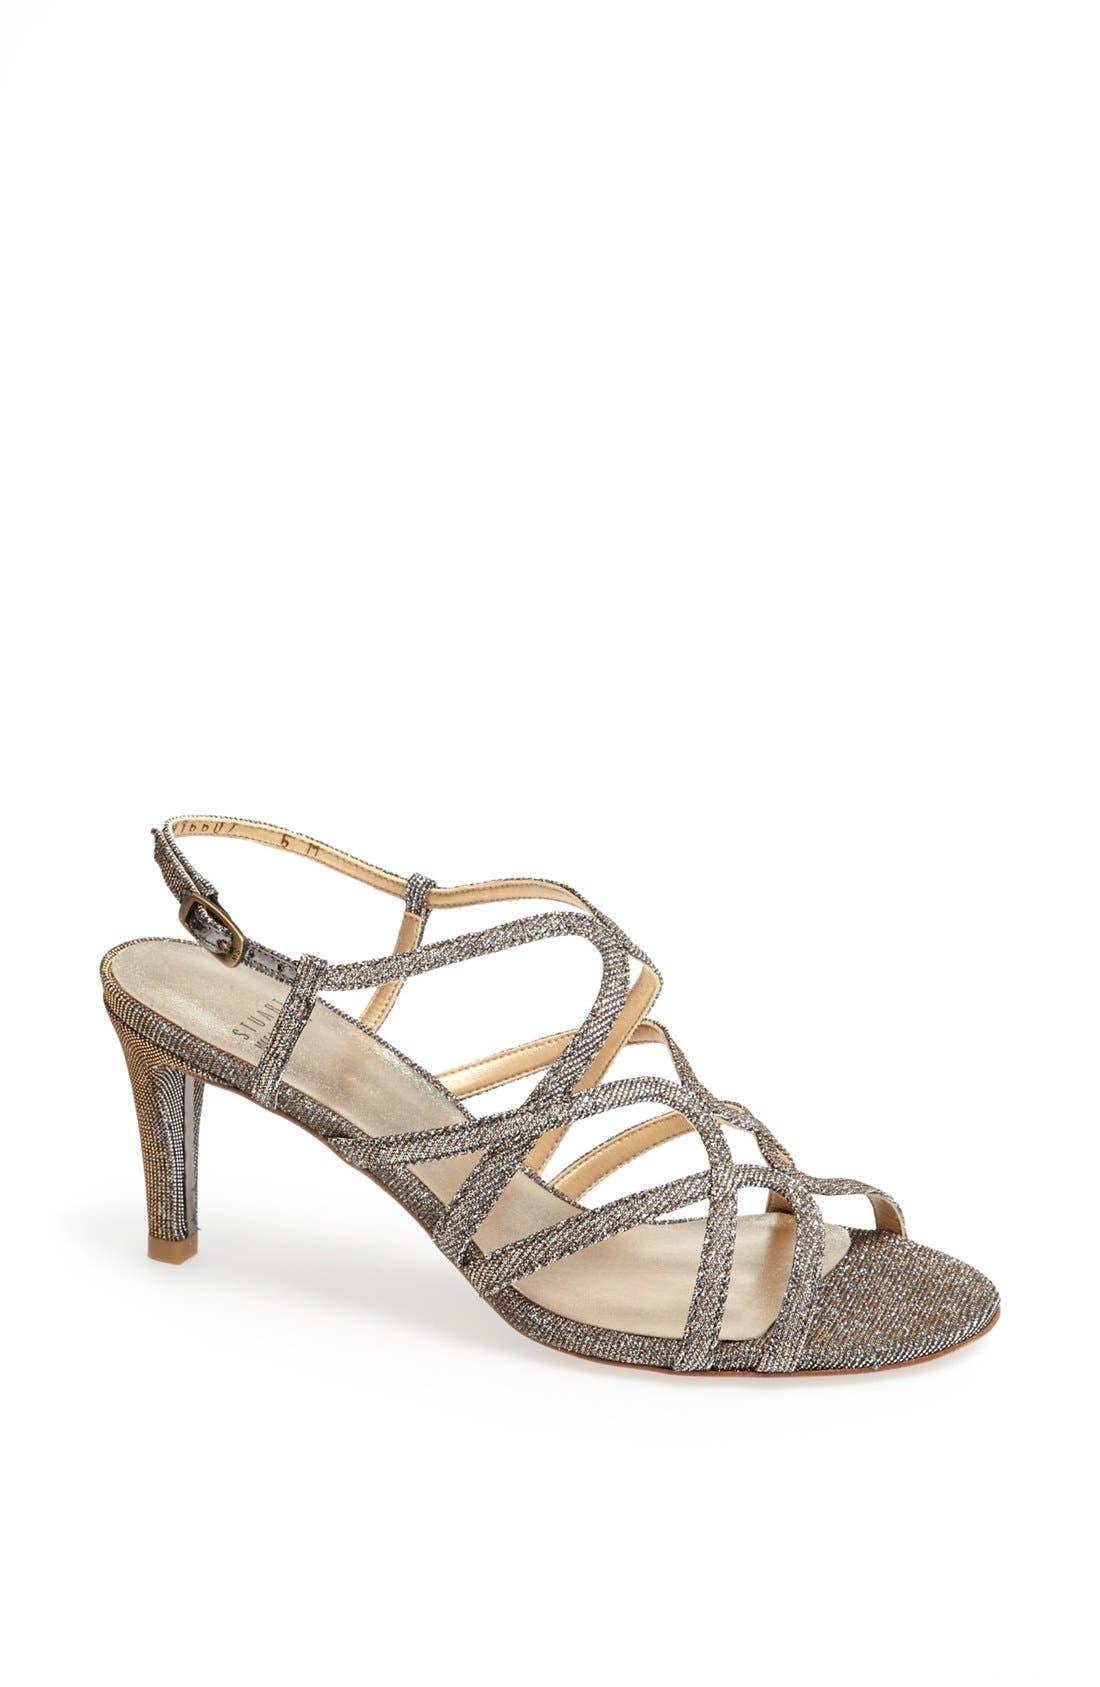 'Turningup' Sandal,                         Main,                         color, Pyrite Nocturn